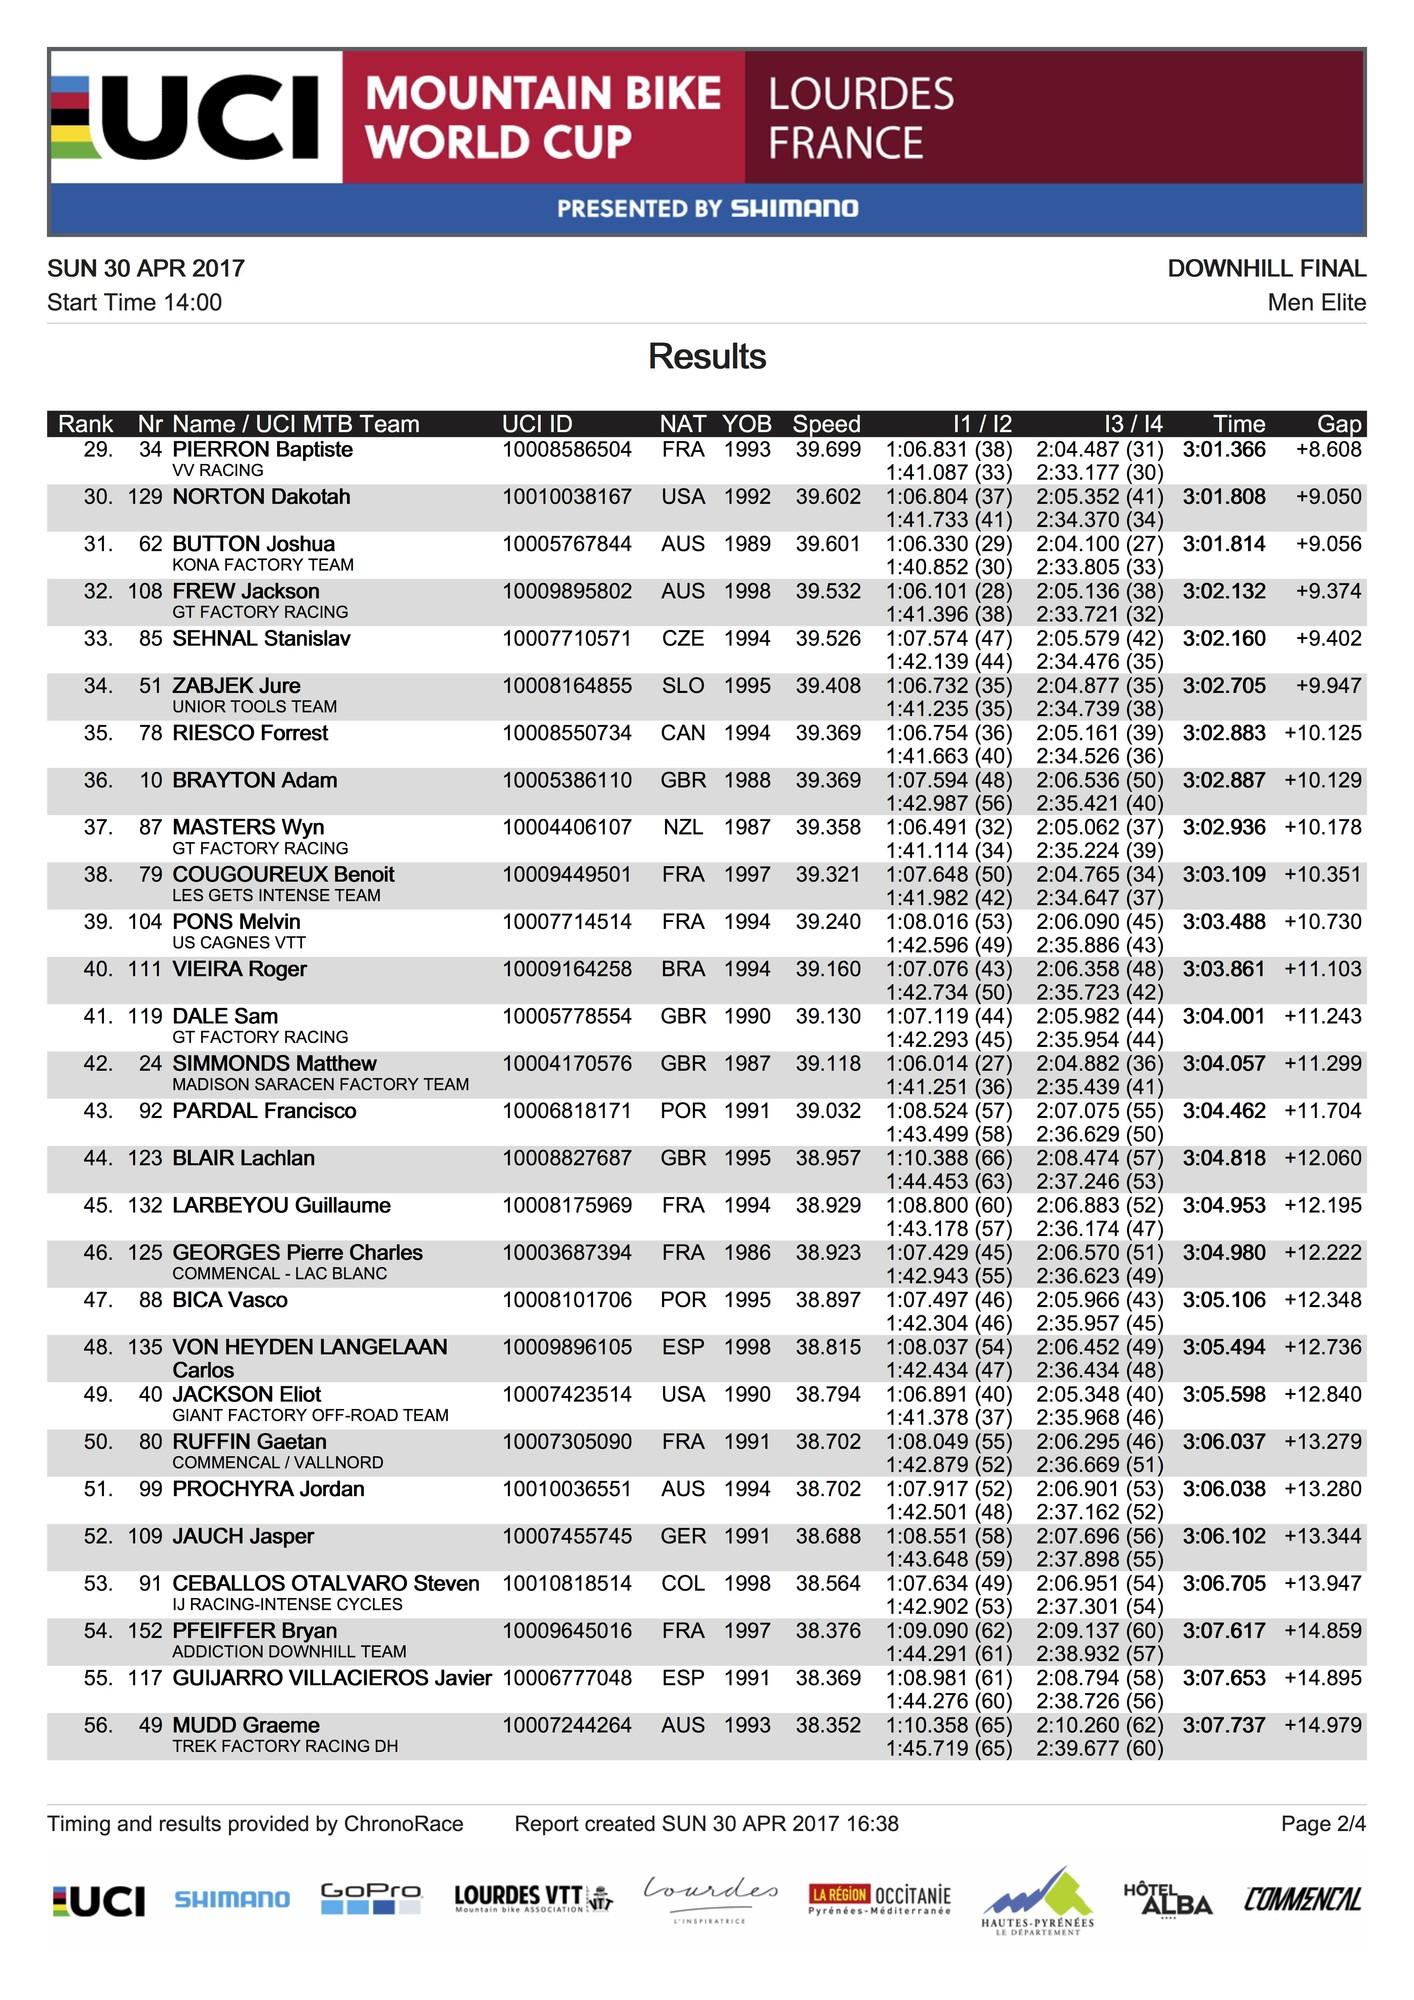 071116c3270 FINAL RESULTS  2017 Lourdes World Cup Downhill - Mountain Bikes News ...